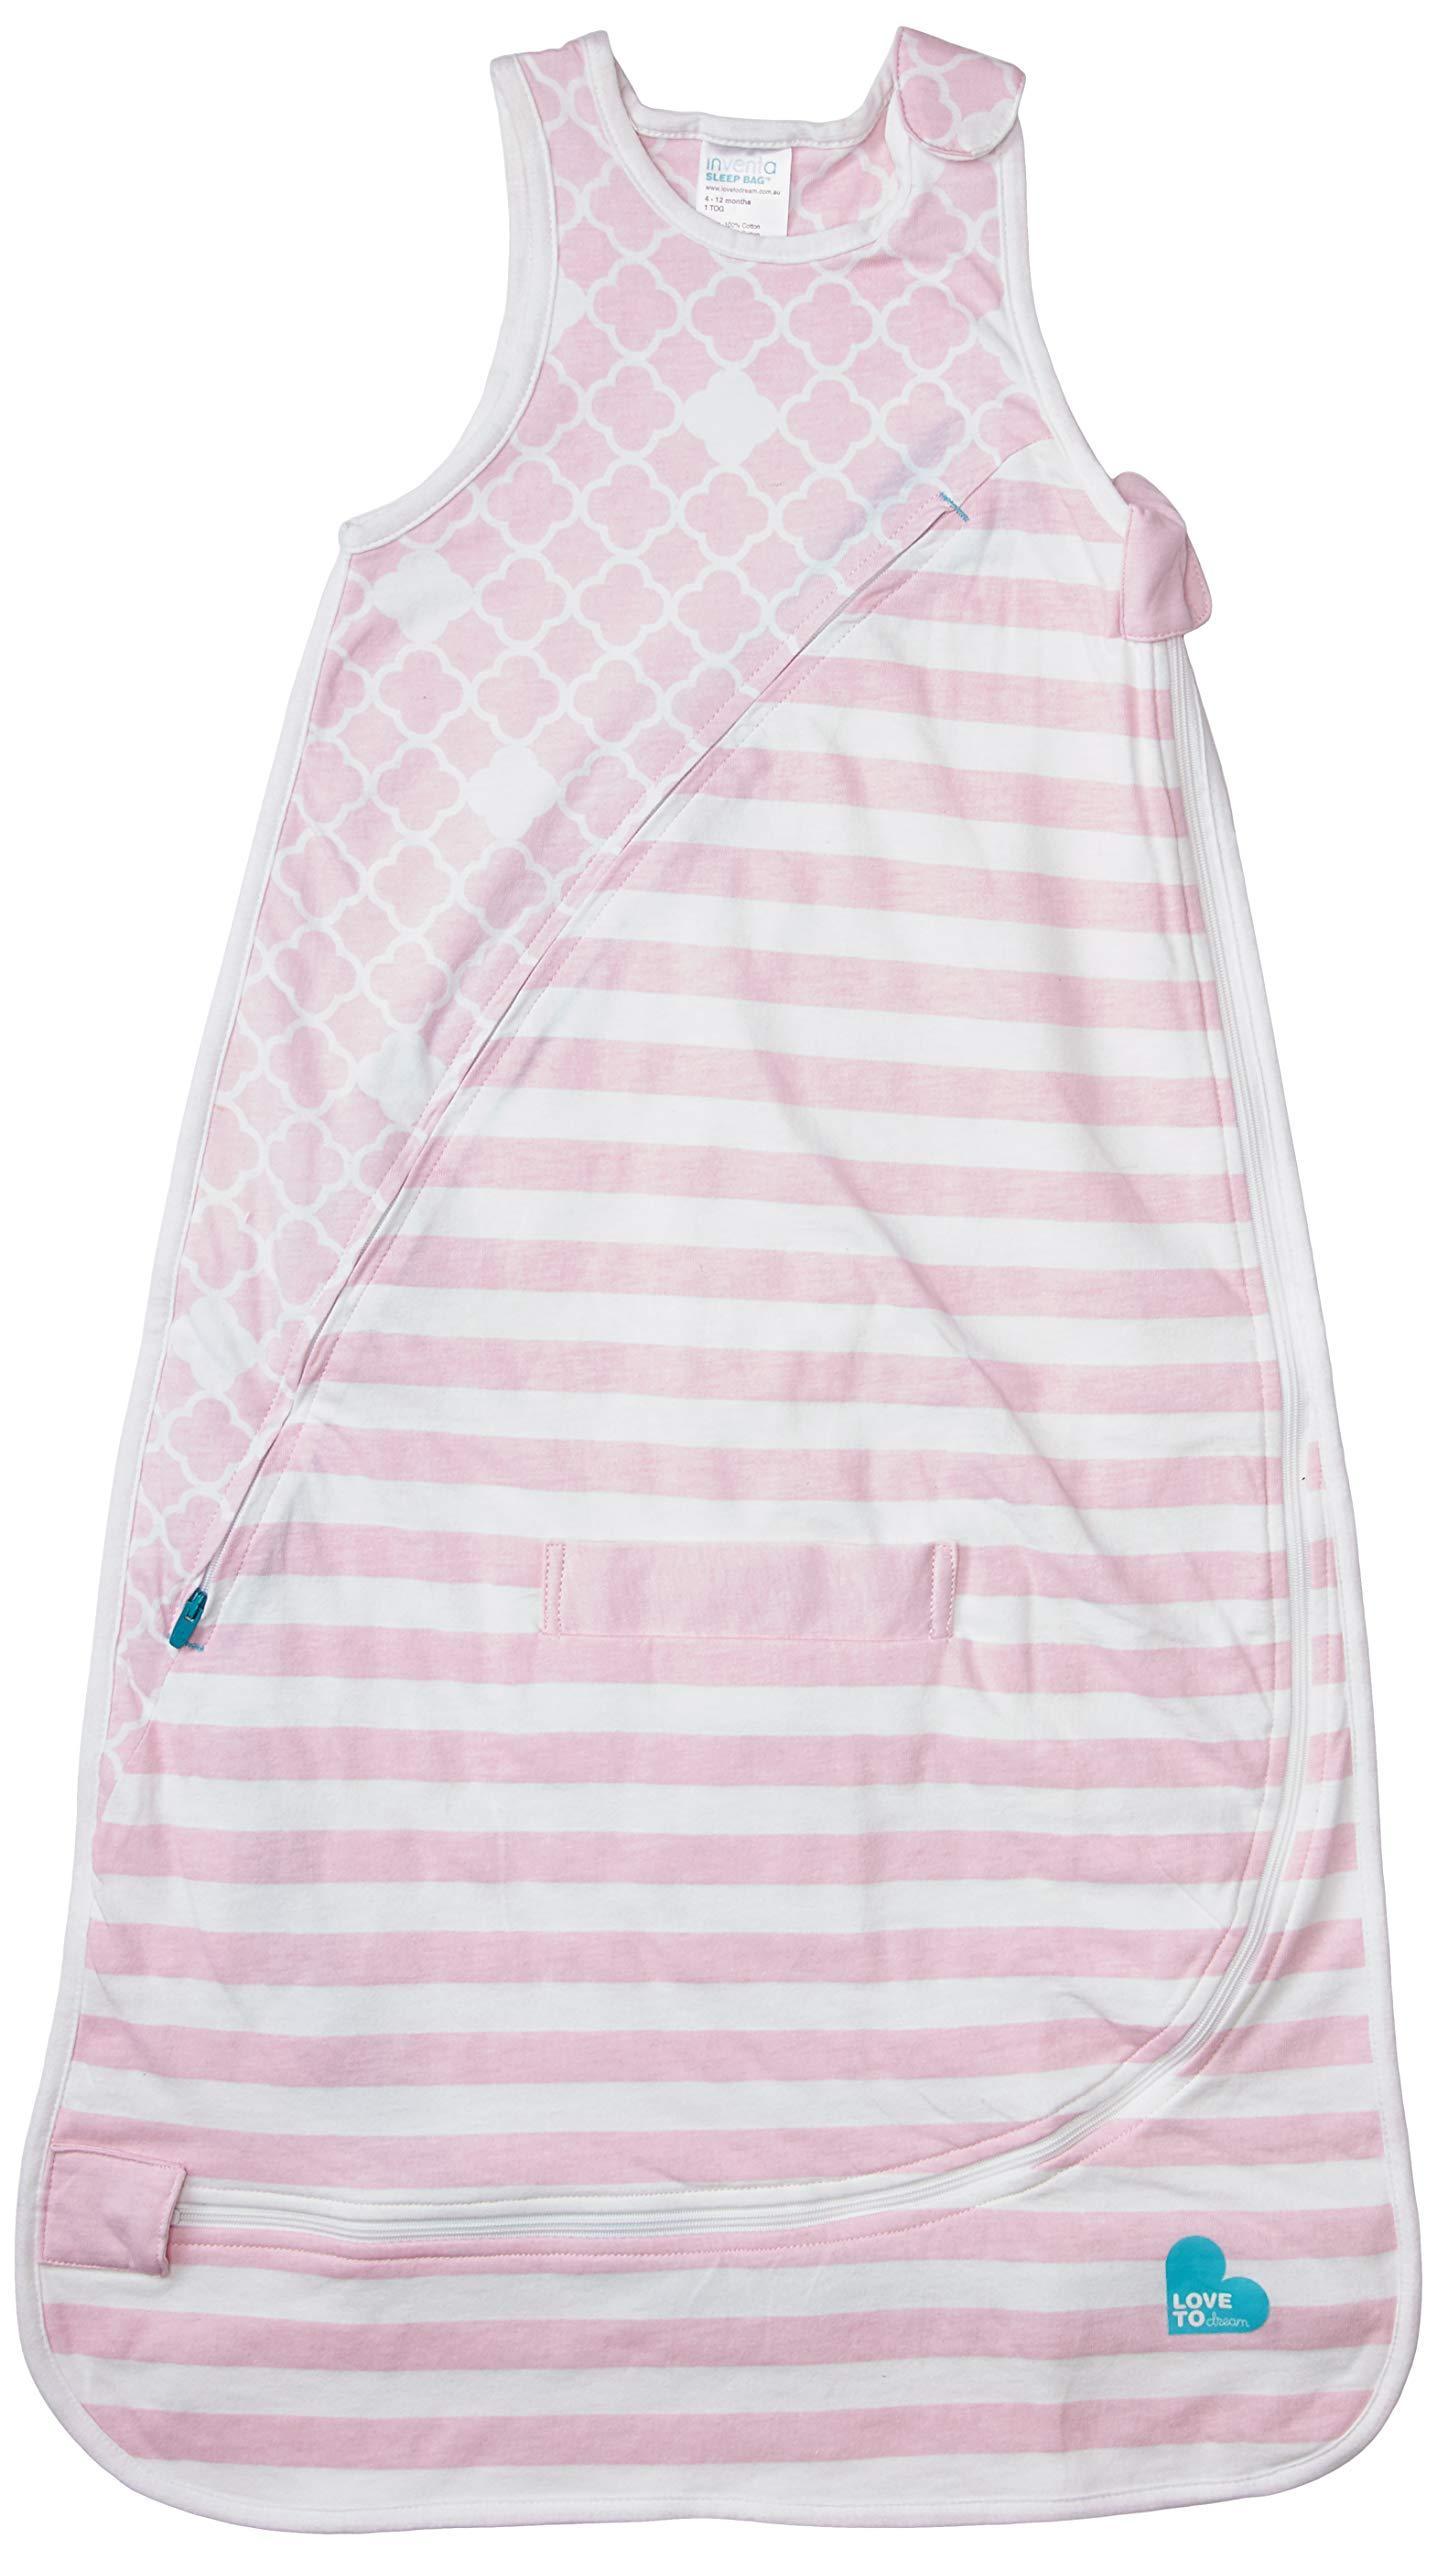 9fa9327b9612 Amazon.com  Love To Dream Inventa Sleep Bag Wearable Blanket with ...